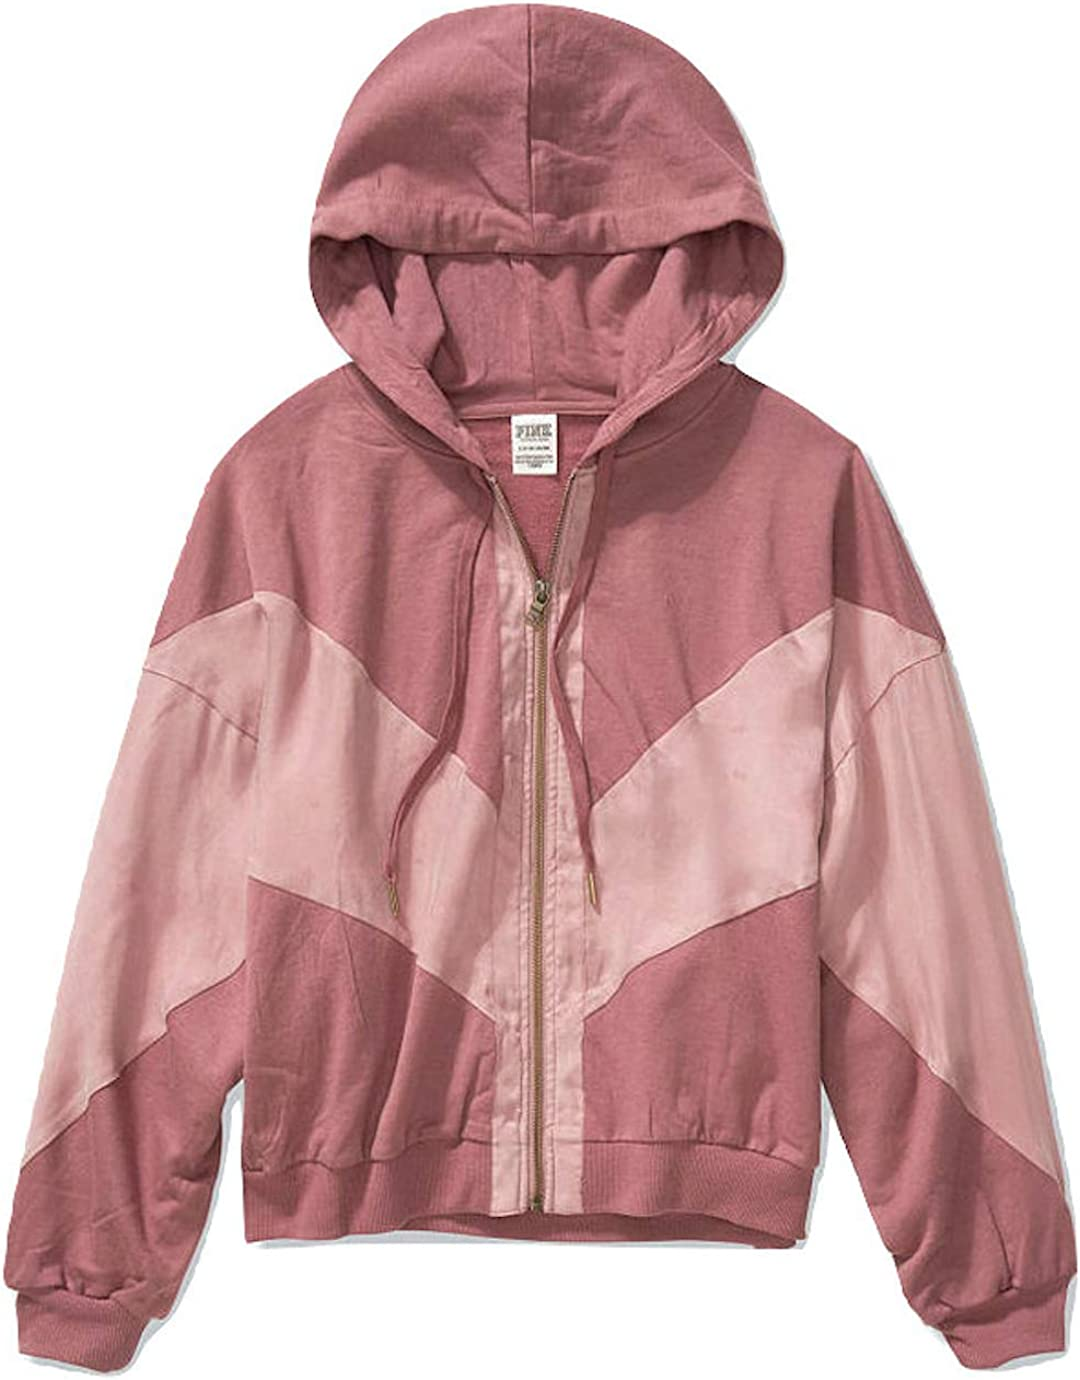 Victoria's Secret womens Full Zip,hoodie